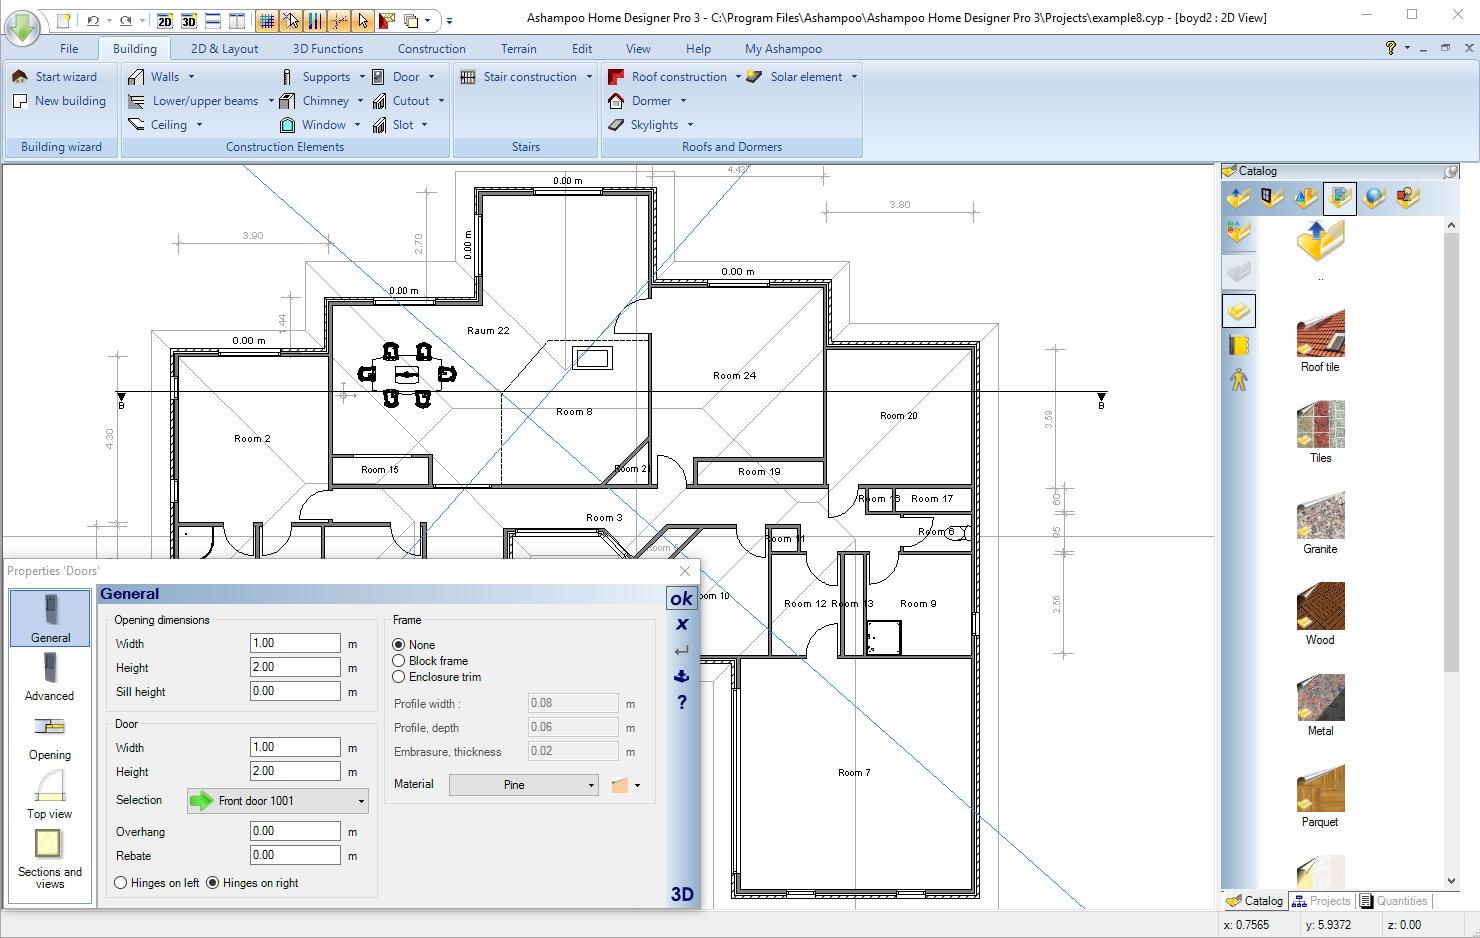 Amazoncom Ashampoo Home Designer Pro  Download Software - Home designer pro